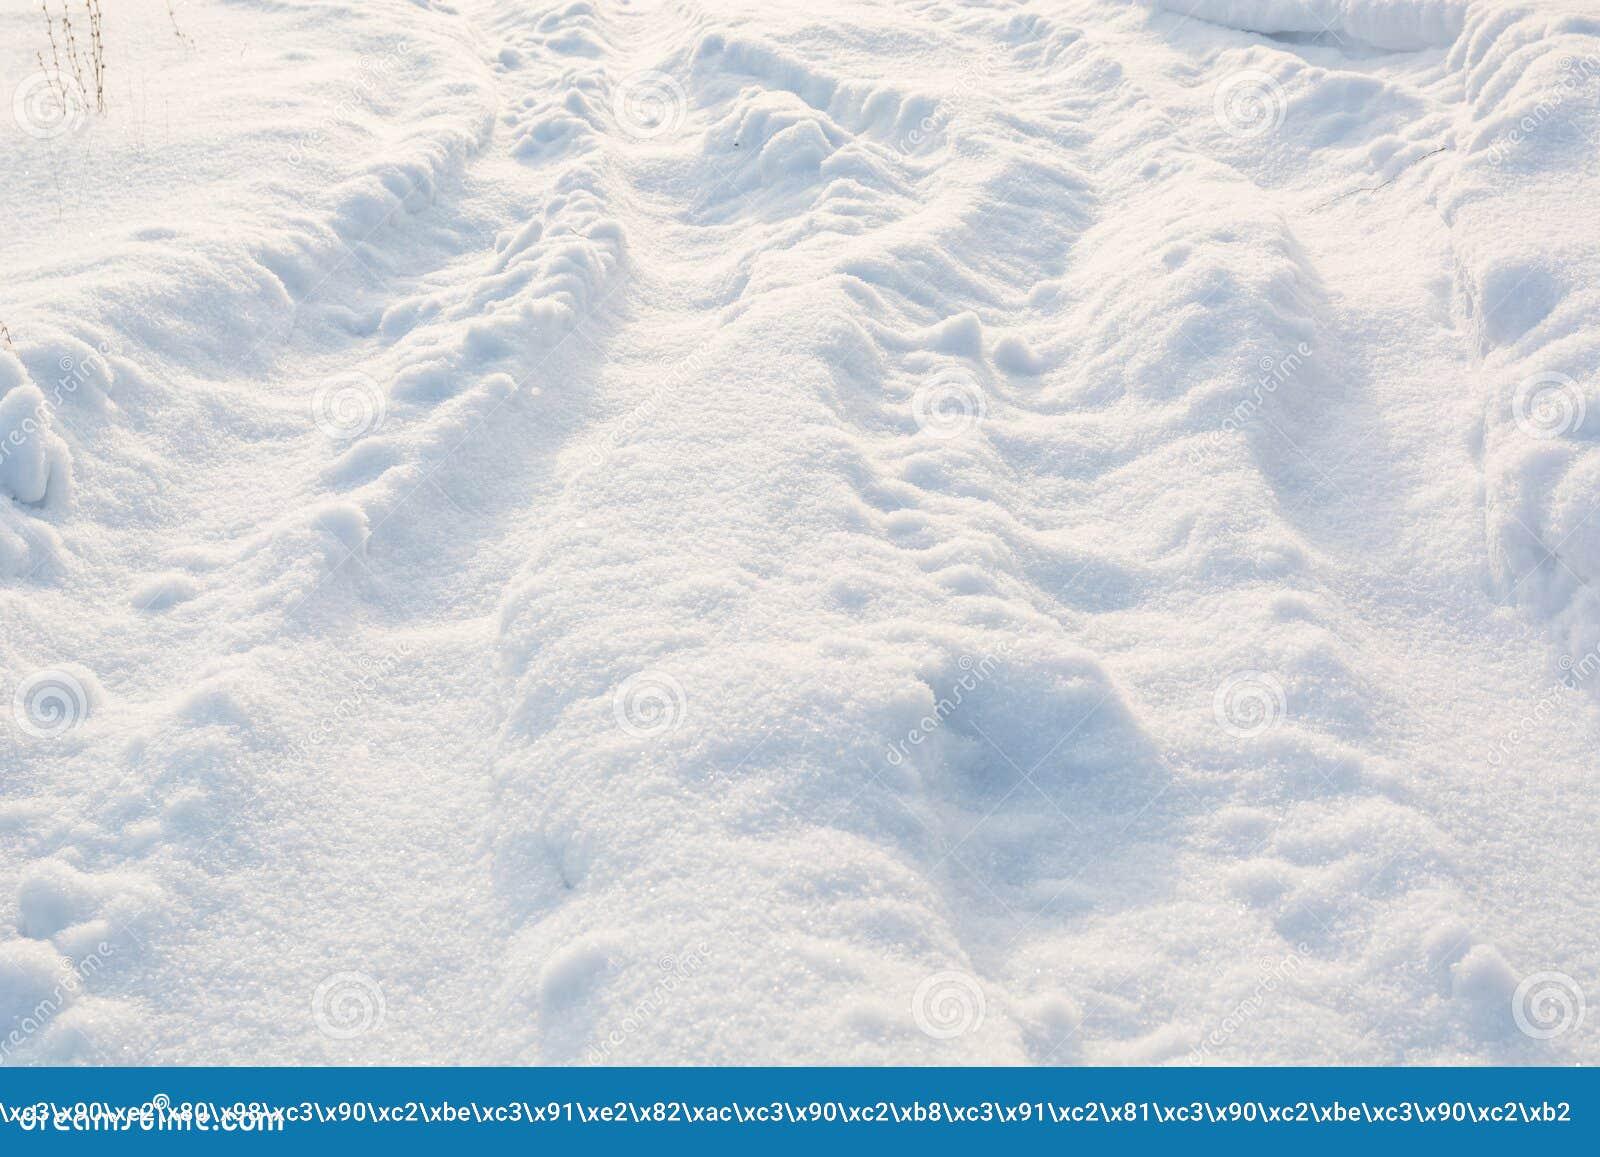 Road in winter on snow. Snowy road.